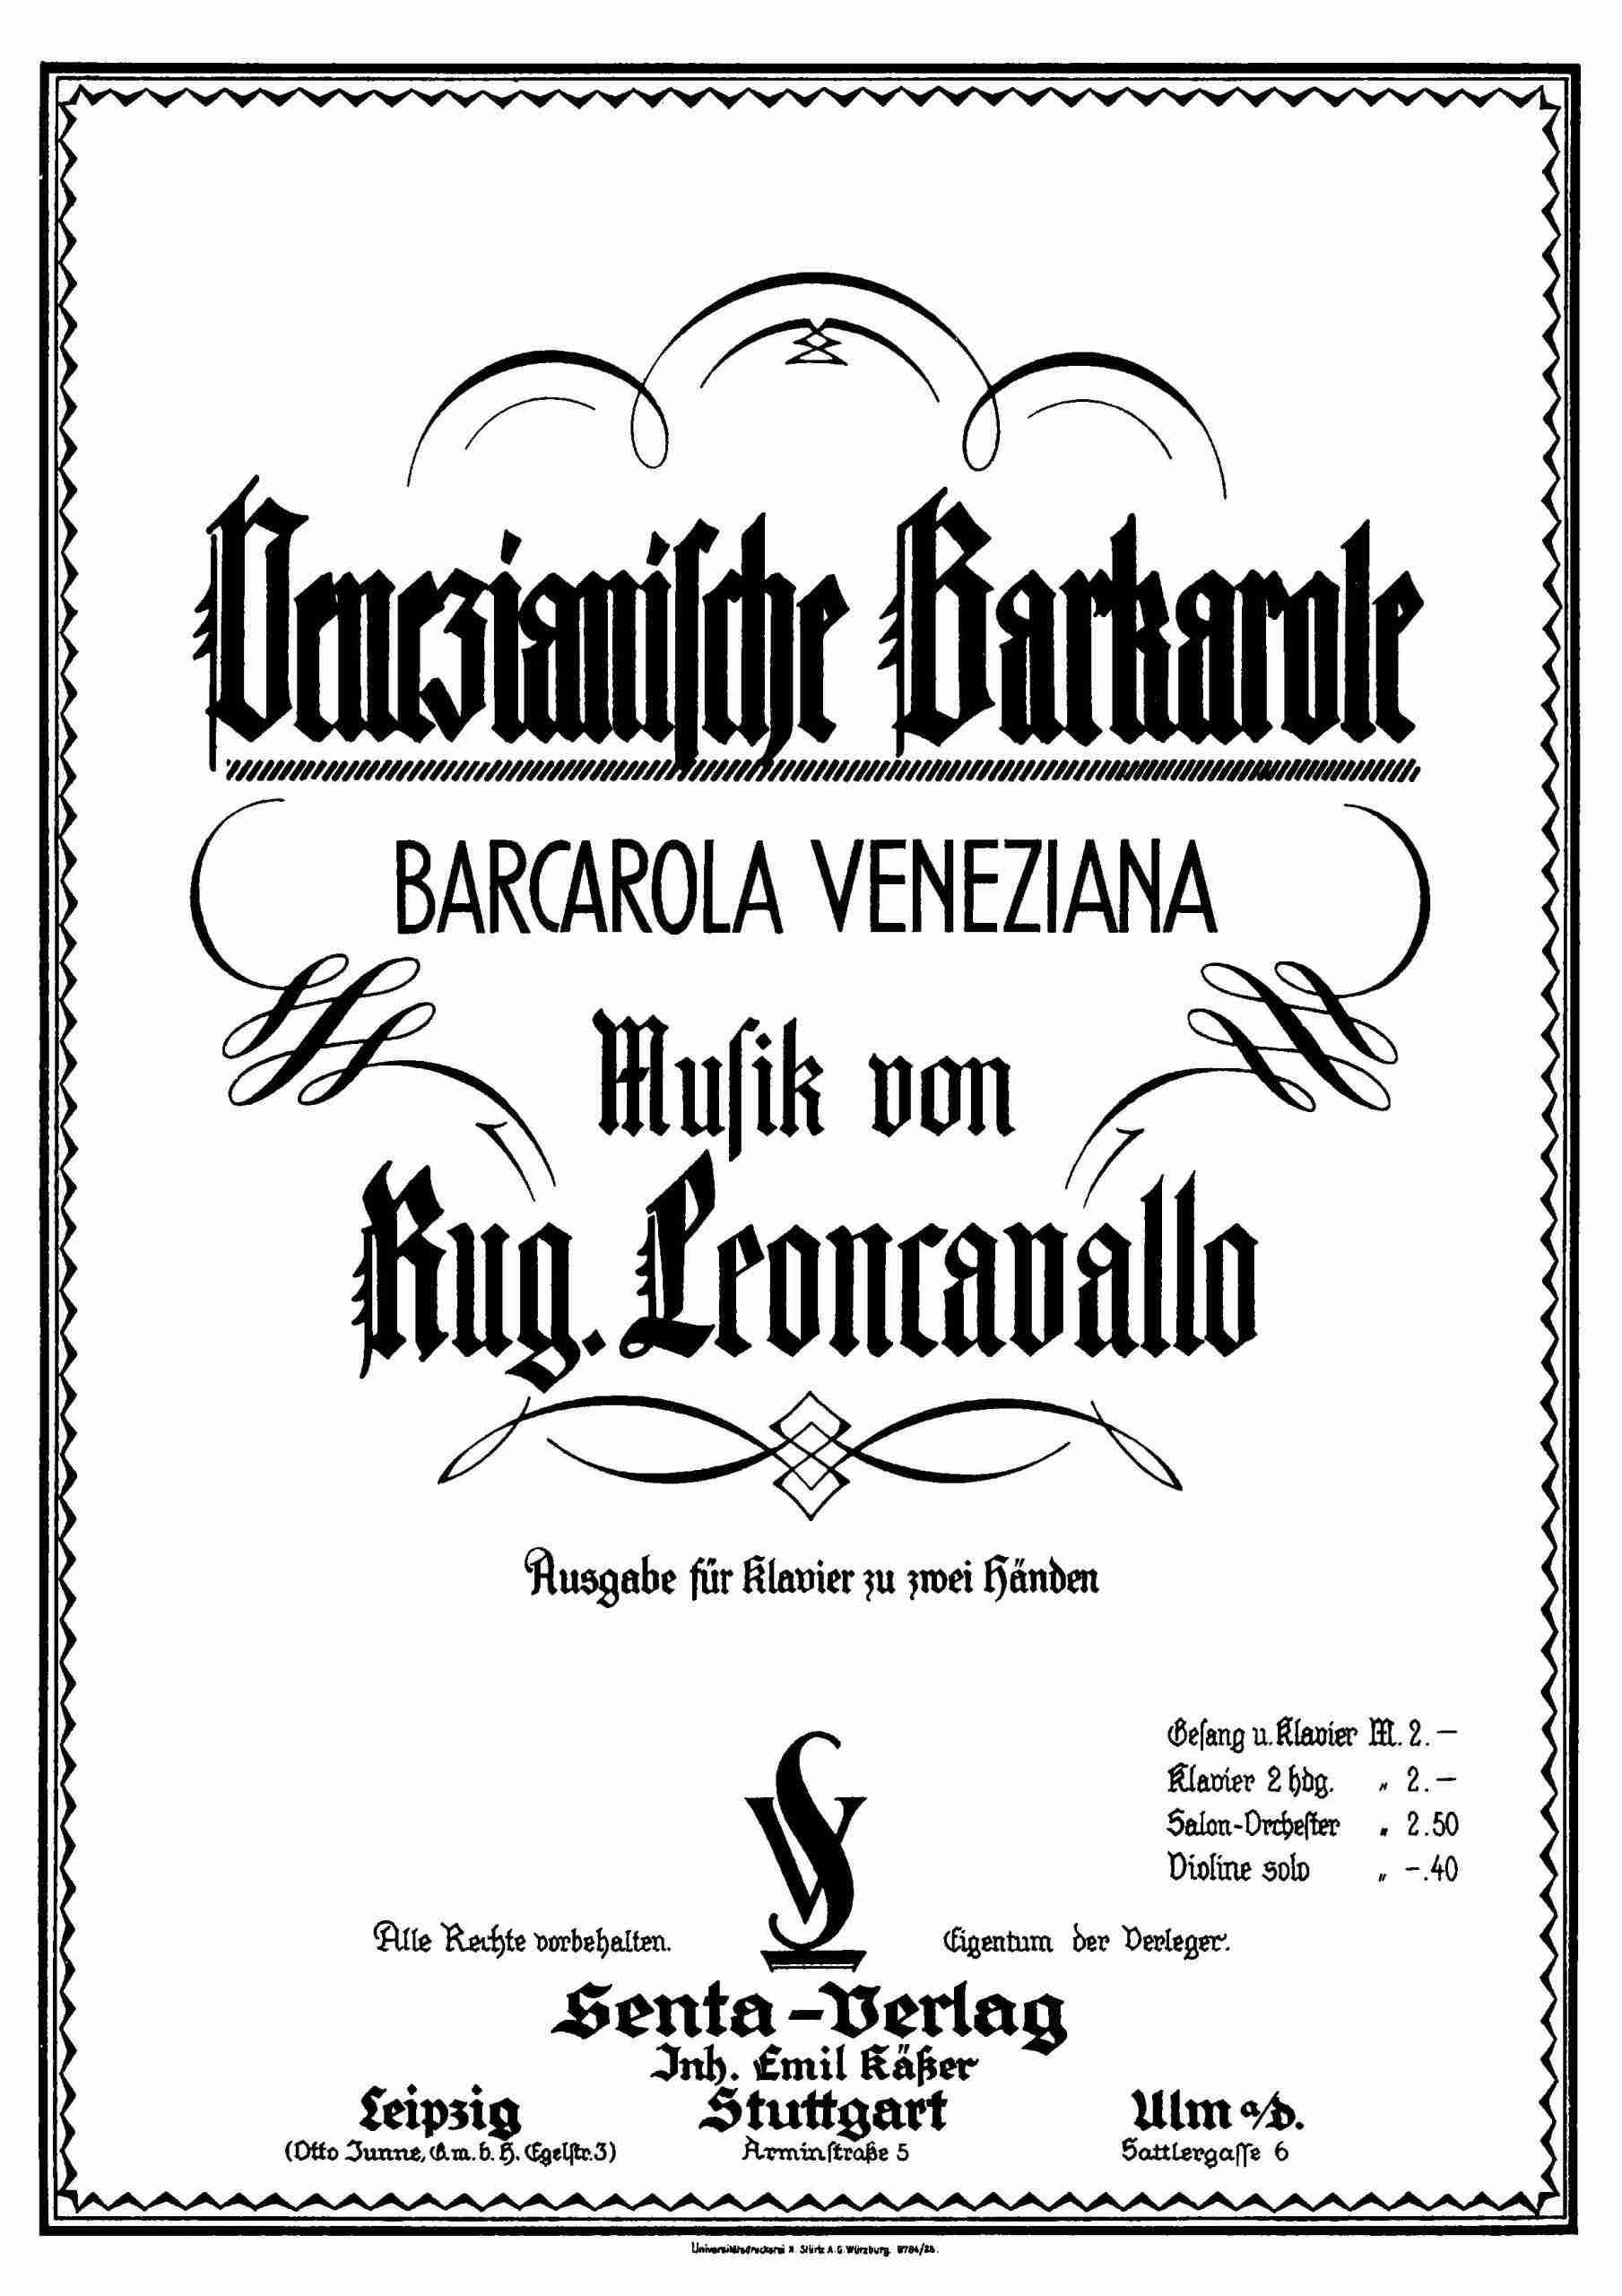 Leoncavallo, Ruggiero - Barcarola Veneziana